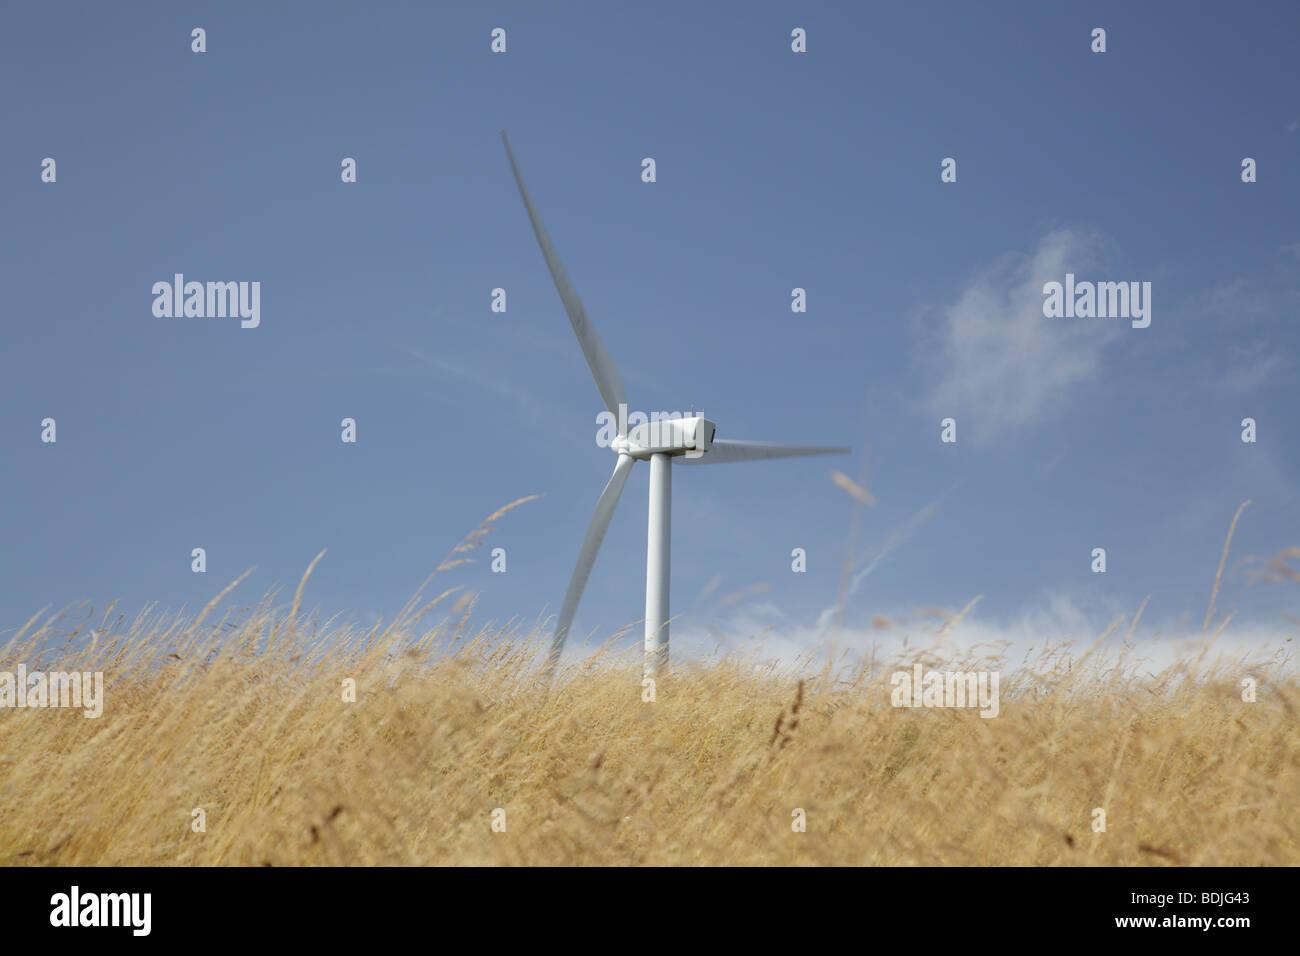 Wind turbine on a Wind Farm in Ayrshire, Scotland, UK - Stock Image